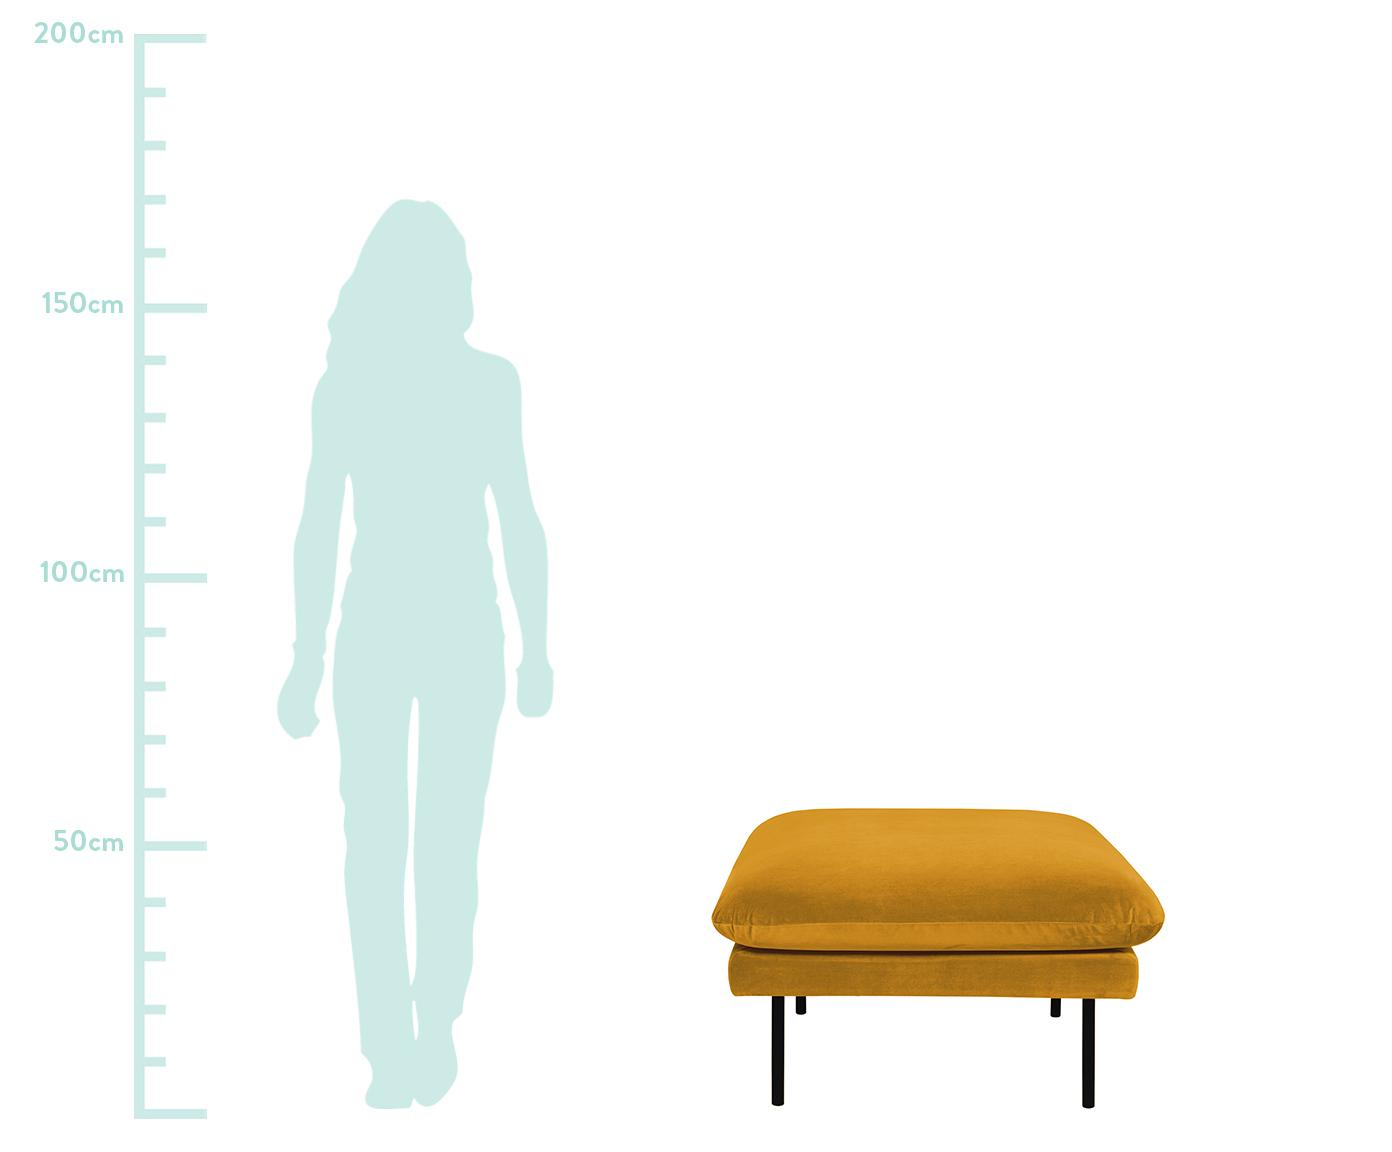 Sofa-Hocker Moby aus Samt, Bezug: Samt (Hochwertiger Polyes, Gestell: Massives Kiefernholz, Füße: Metall, pulverbeschichtet, Samt Senfgelb, 78 x 48 cm